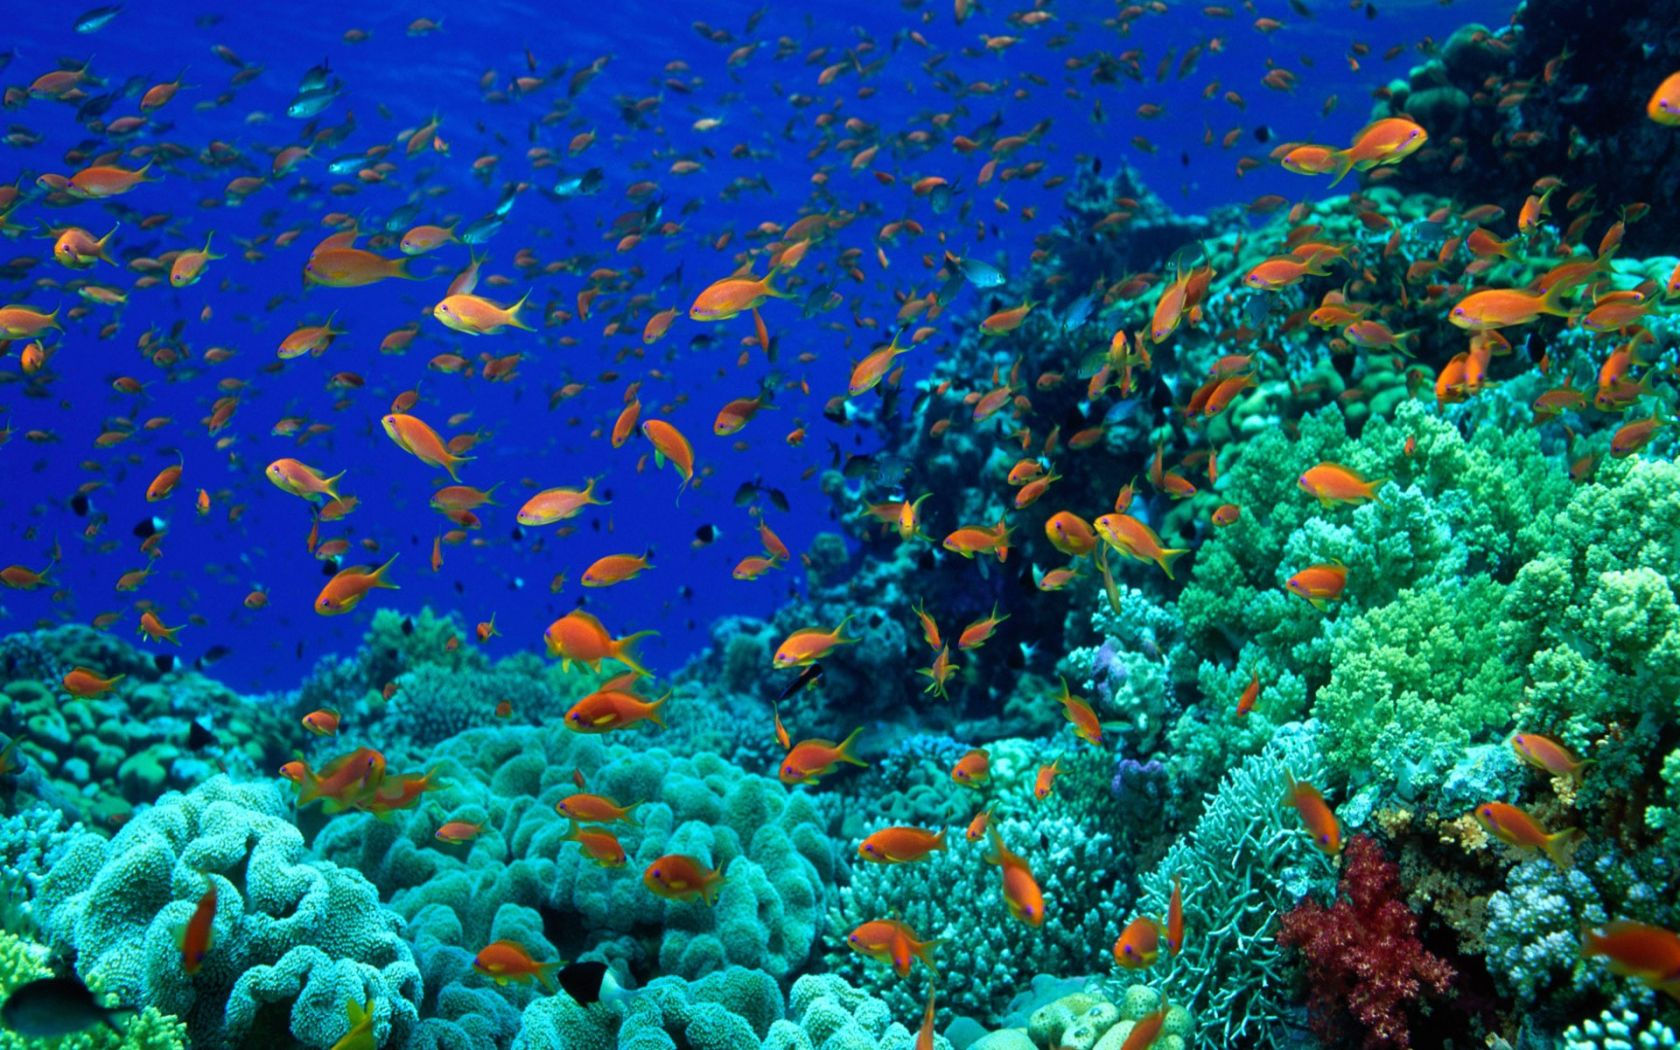 beautiful colorful fish underwater world 6 wallpaper HD